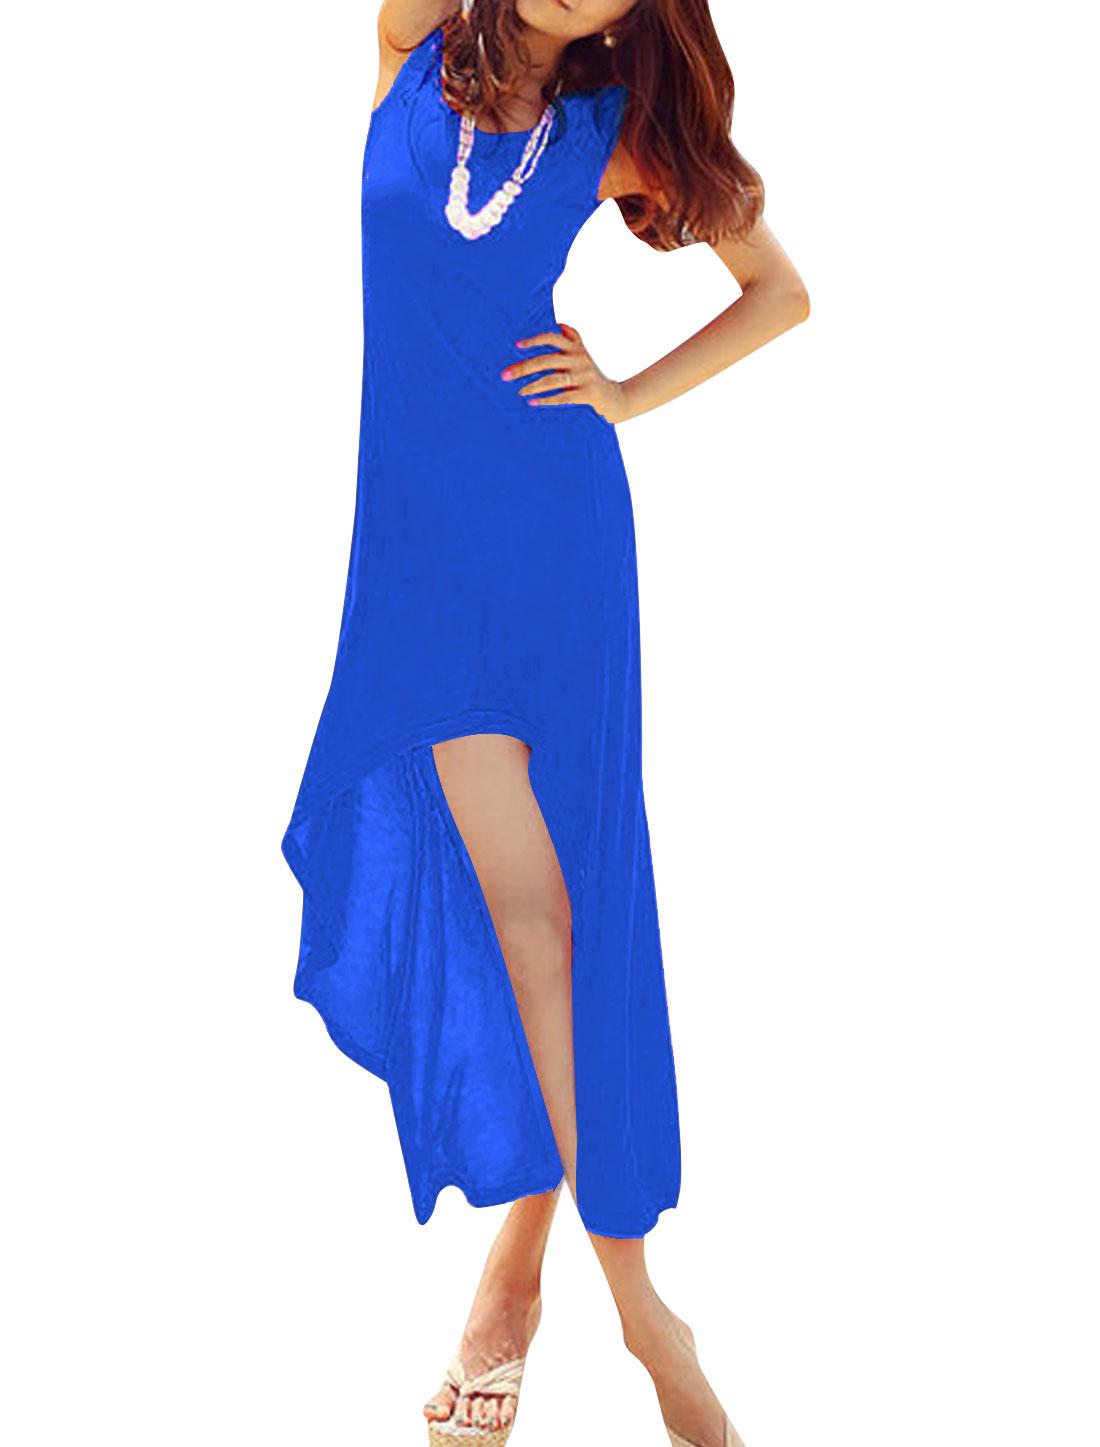 Women Elegant V Neck Sleeveless High Low Hem Dress Royal Blue XS